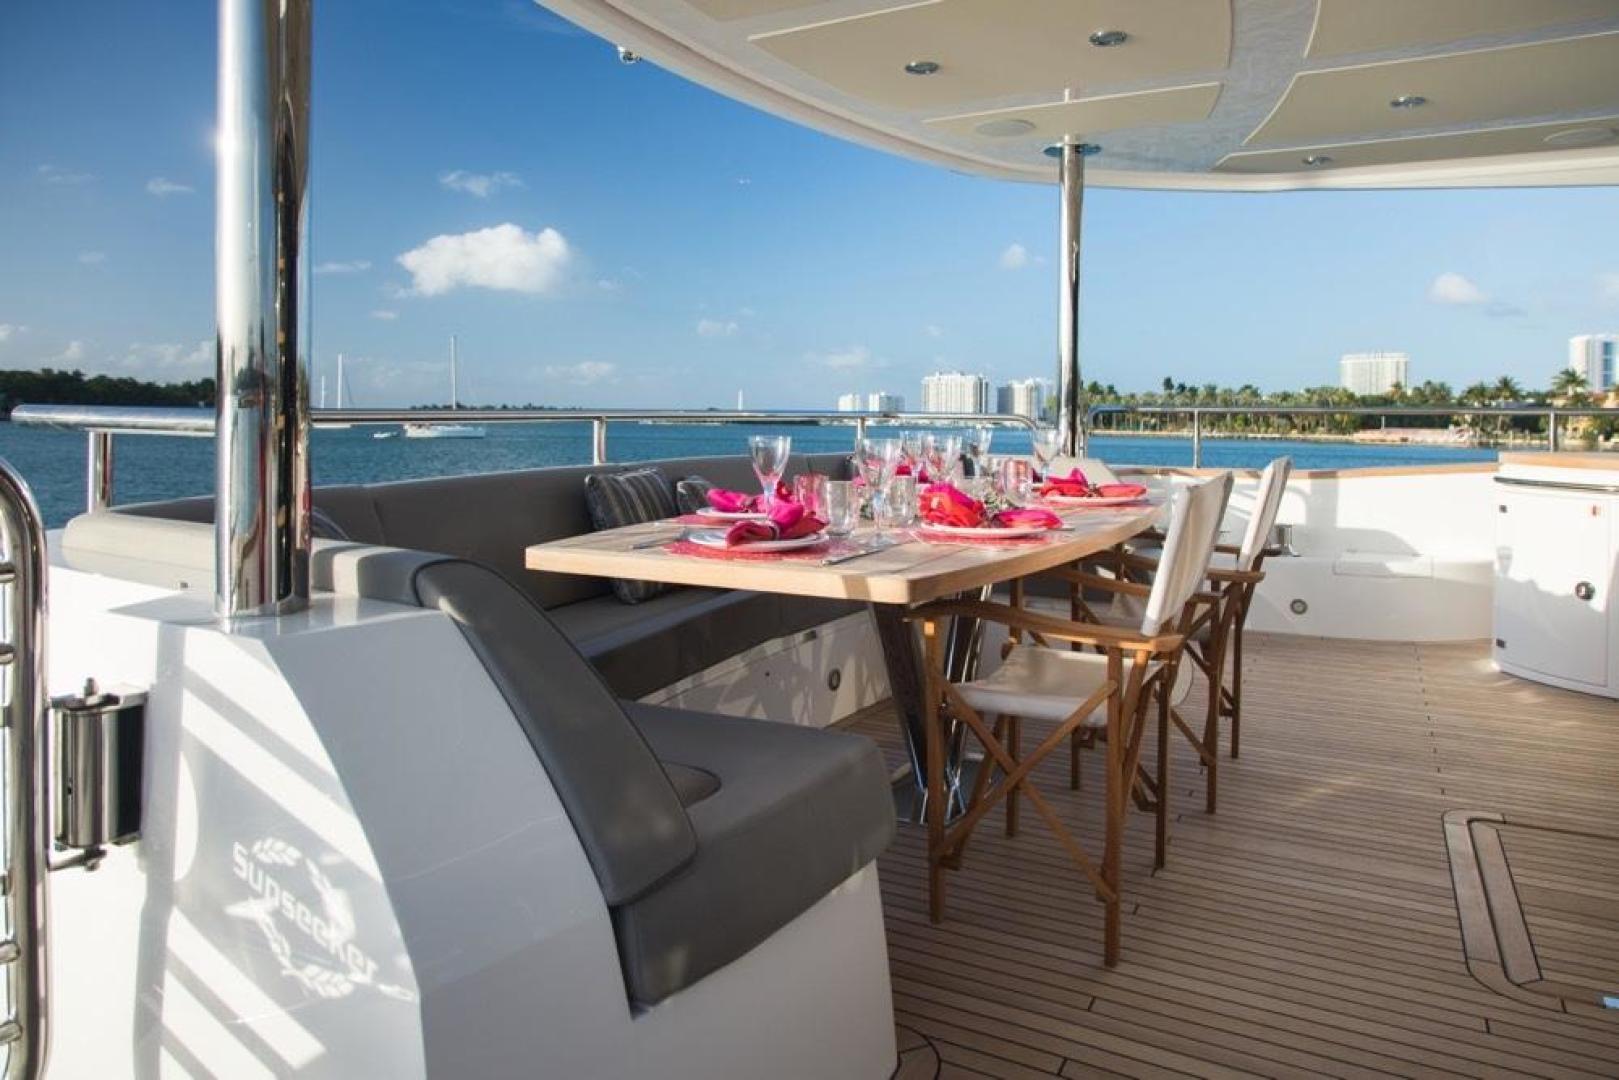 Sunseeker-28 Metre Yacht 2016-RIII Miami-Florida-United States-2016 SUNSEEKER 92 RIII FOR SALE-600089 | Thumbnail